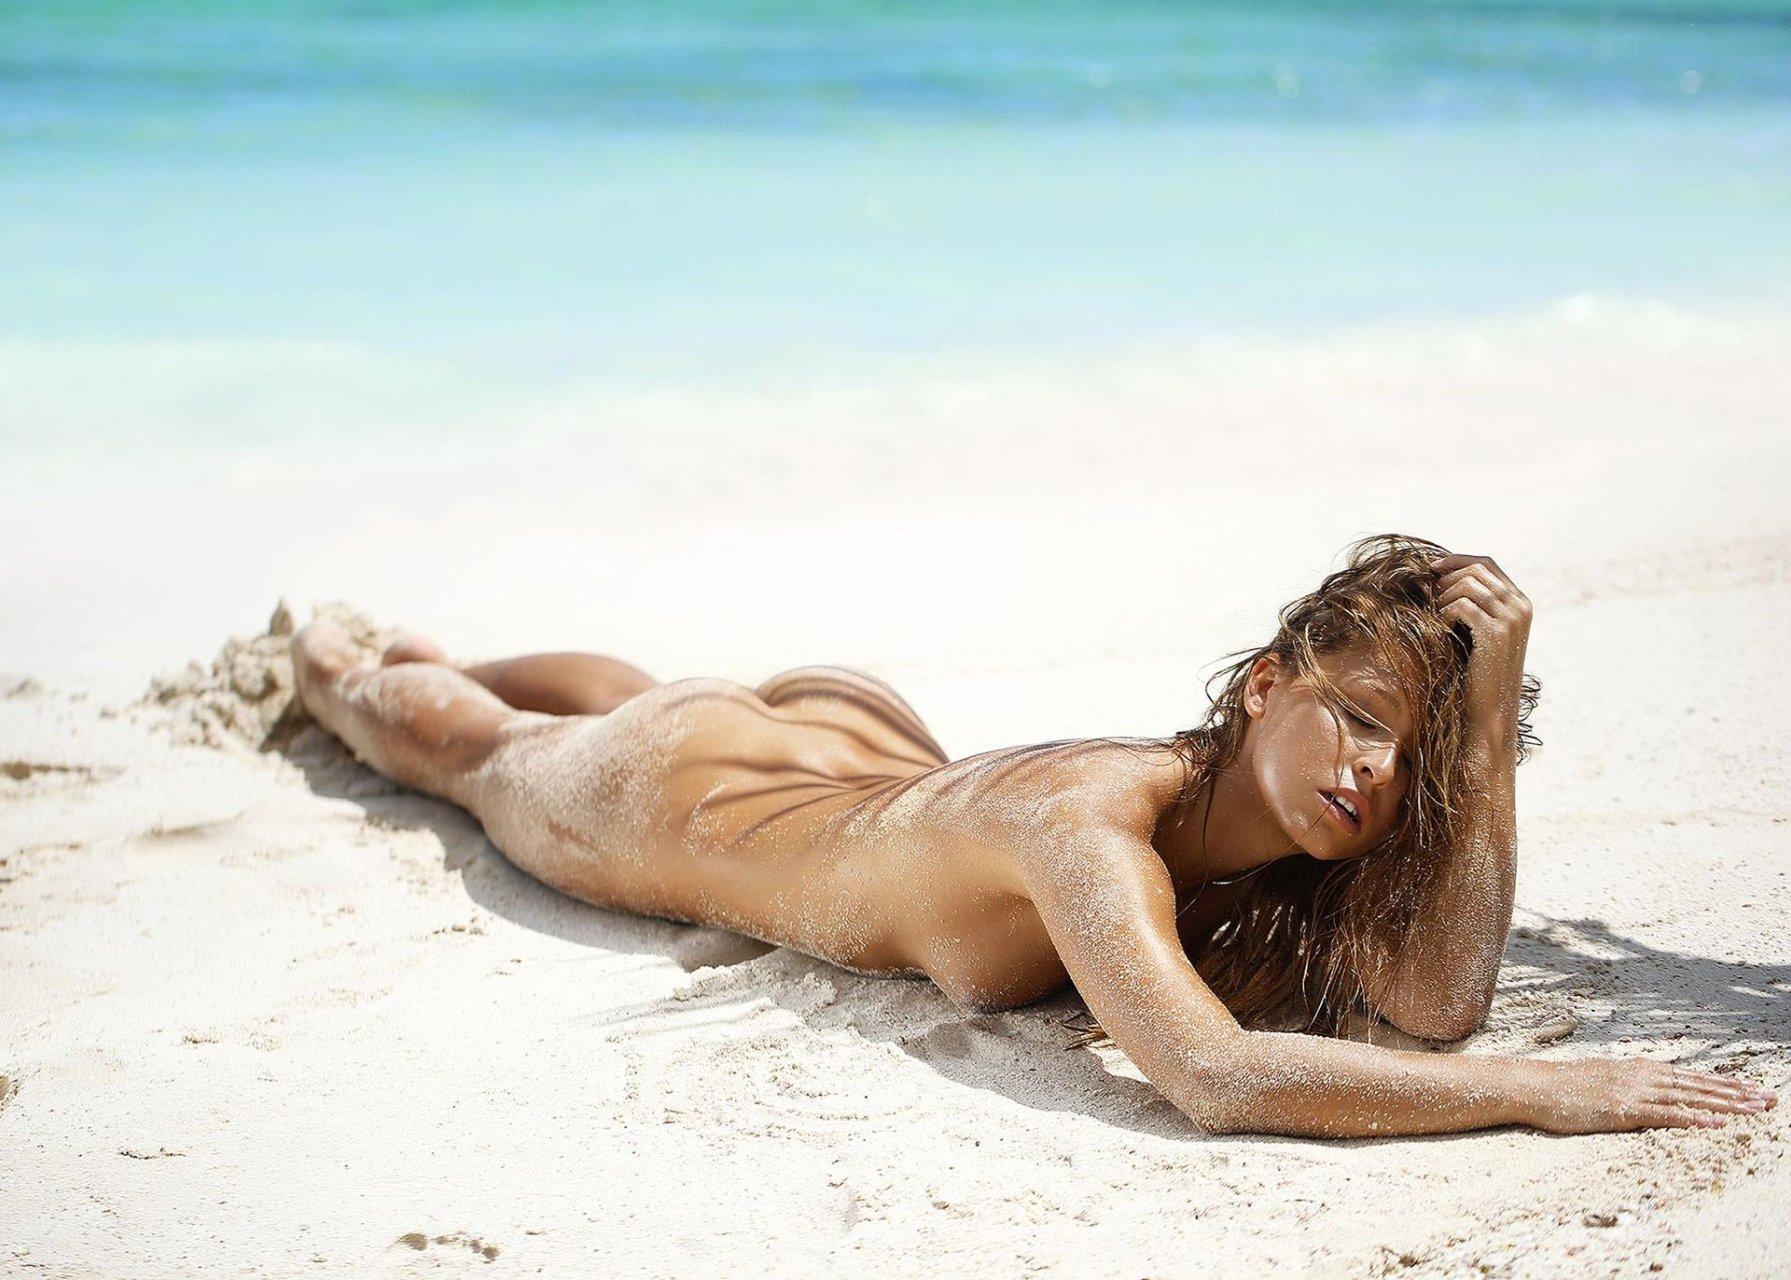 Marisa-Papen-Nude-Sexy-TheFappeningBlog.com-8.jpg